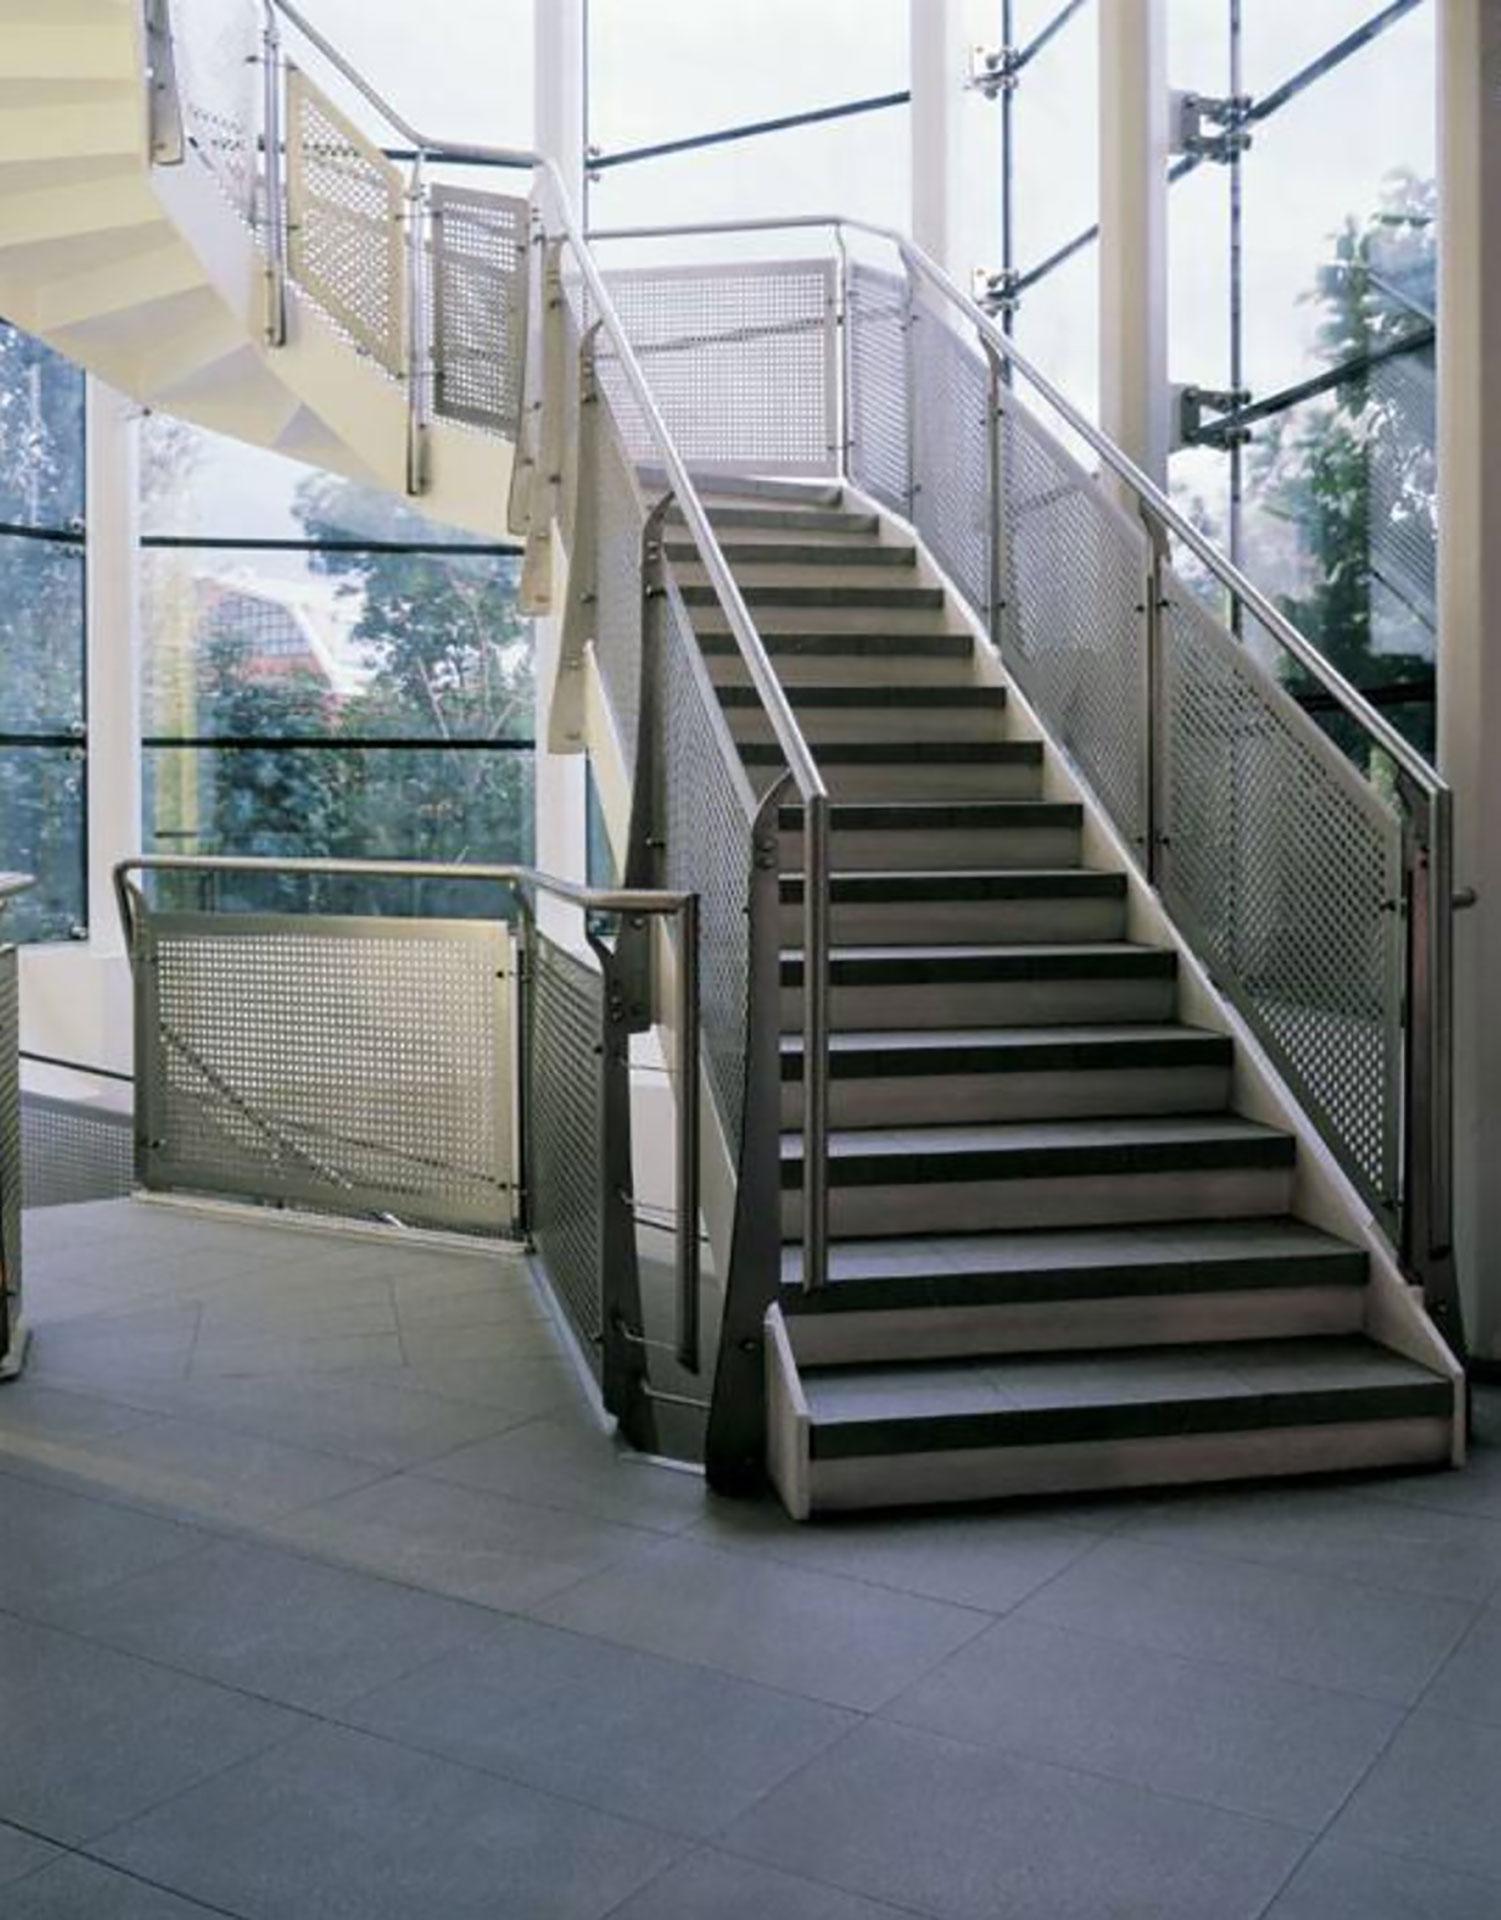 Prevention, wellness, savings: the benefits of raised floors